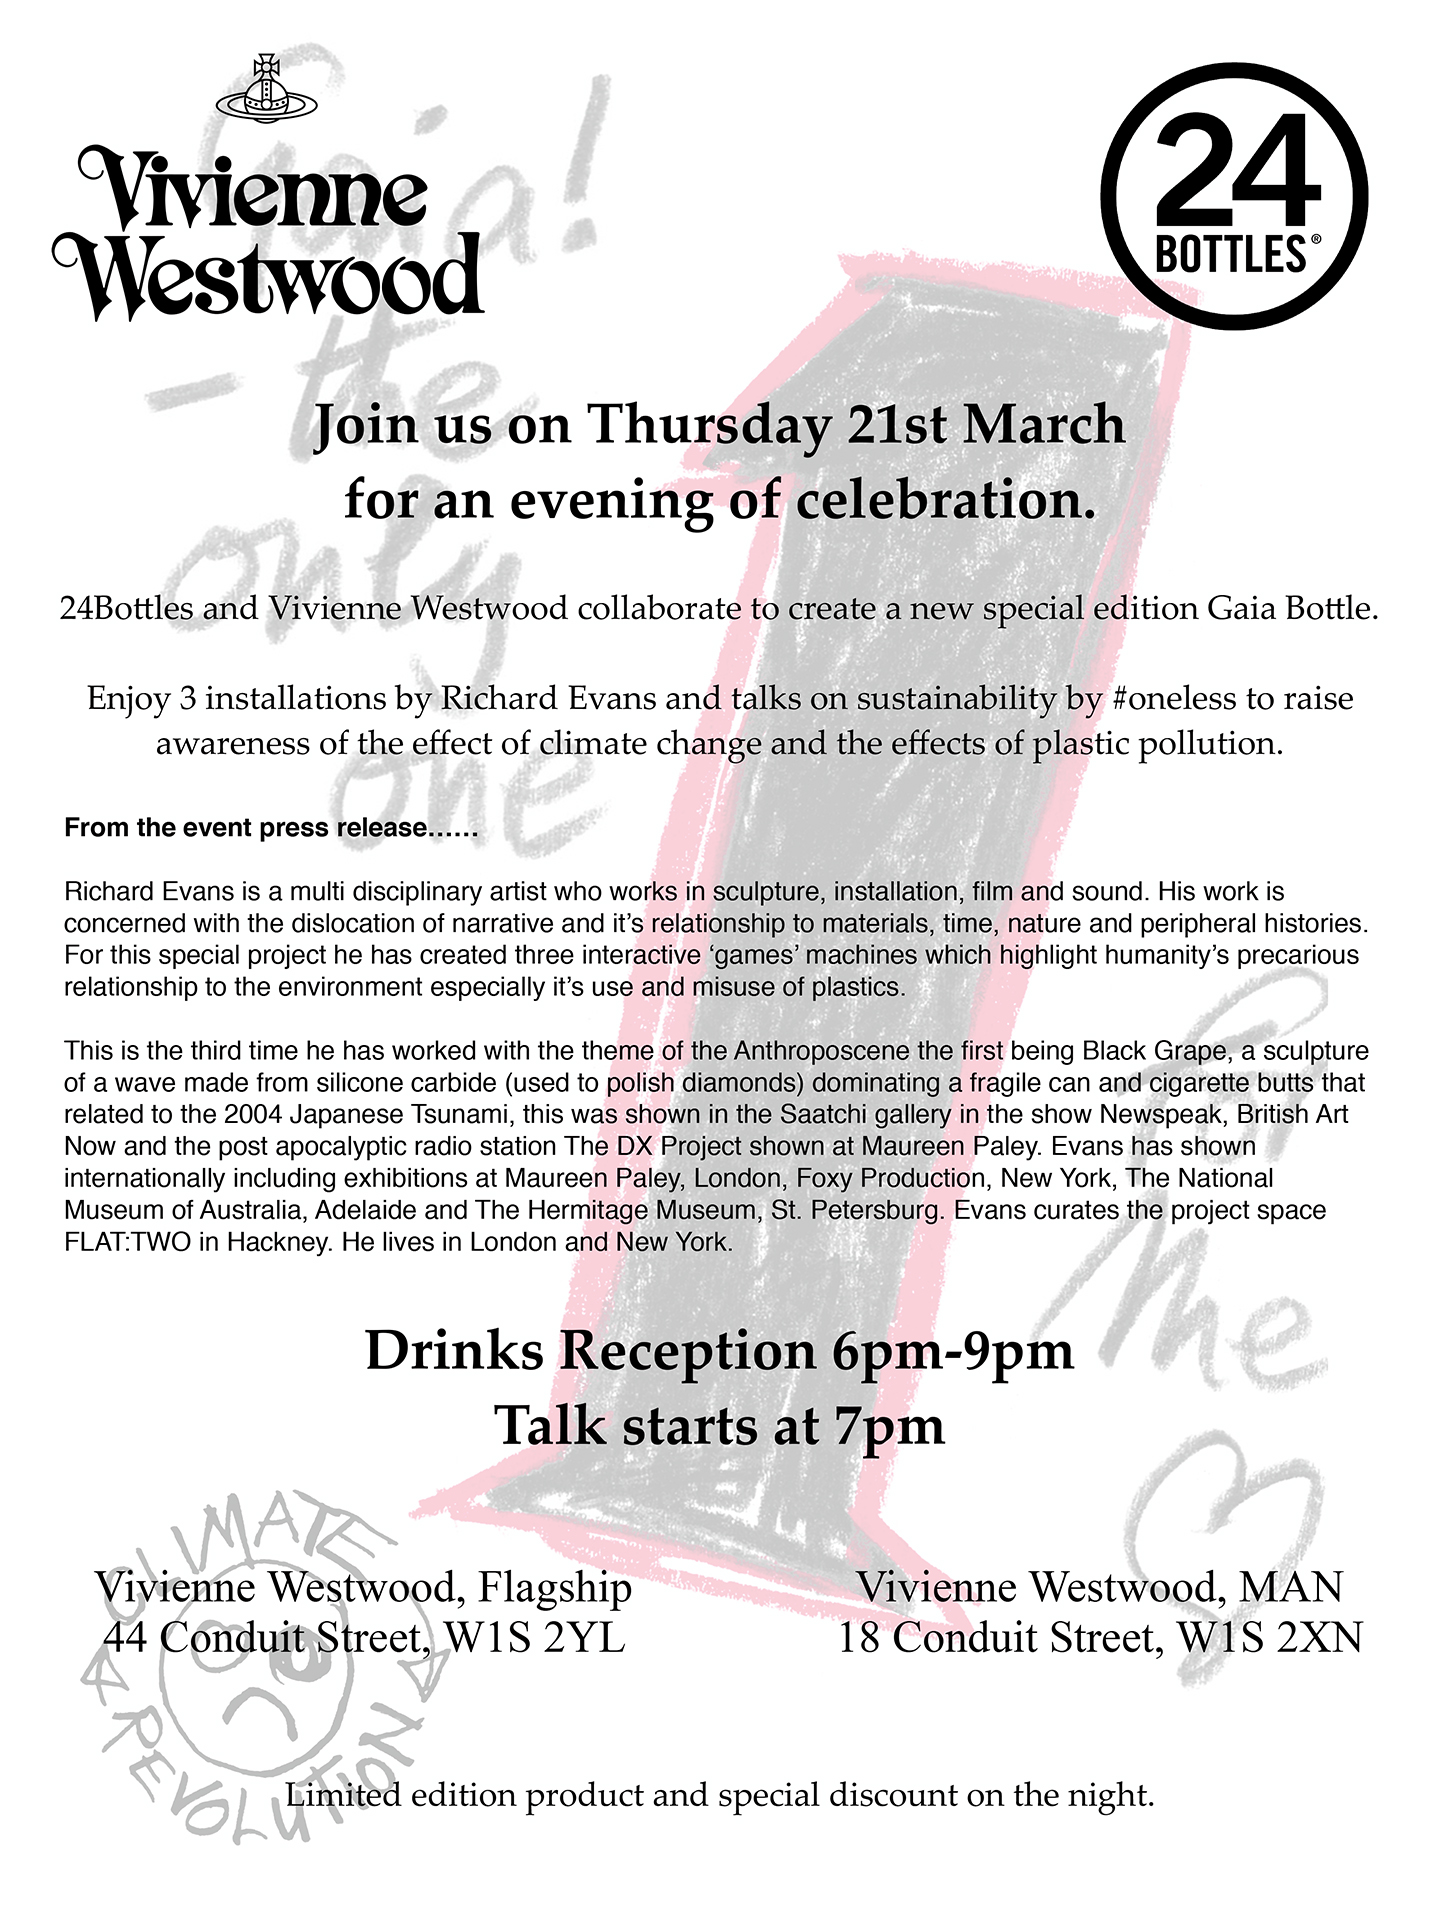 19_4 Vivienne Westwood my invite for press.jpg